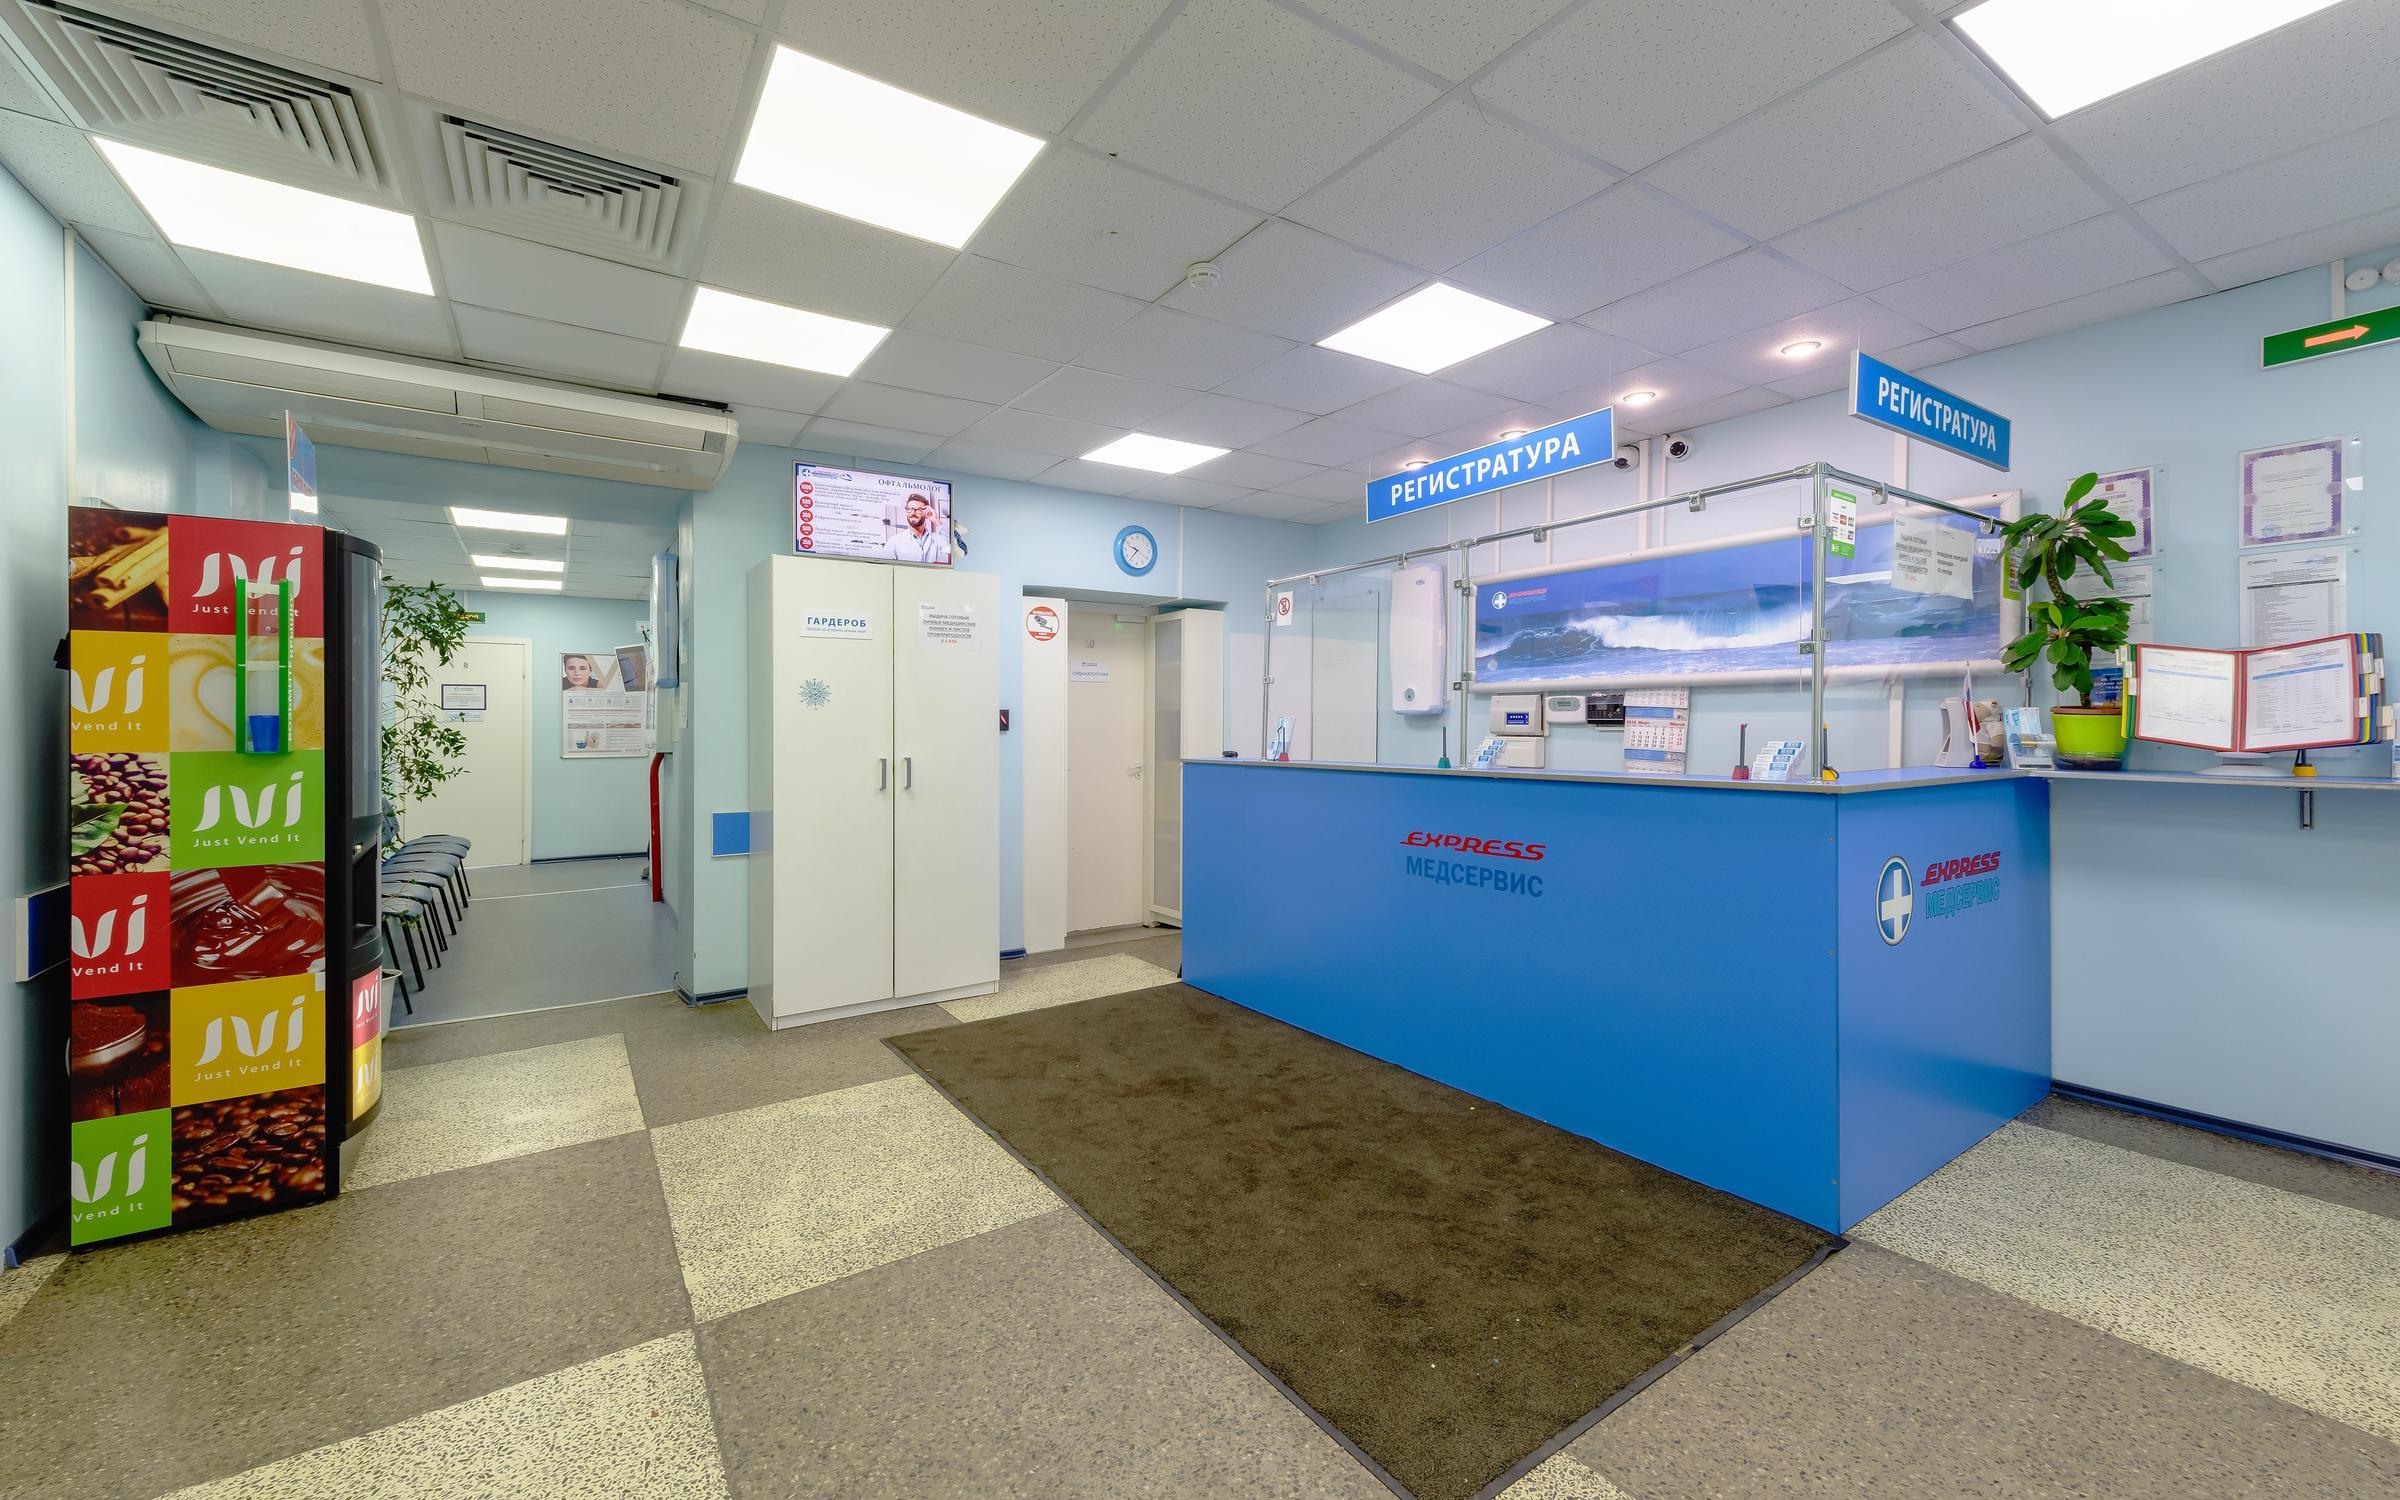 фотография Медицинского центра МедСервис на улице Ярослава Гашека